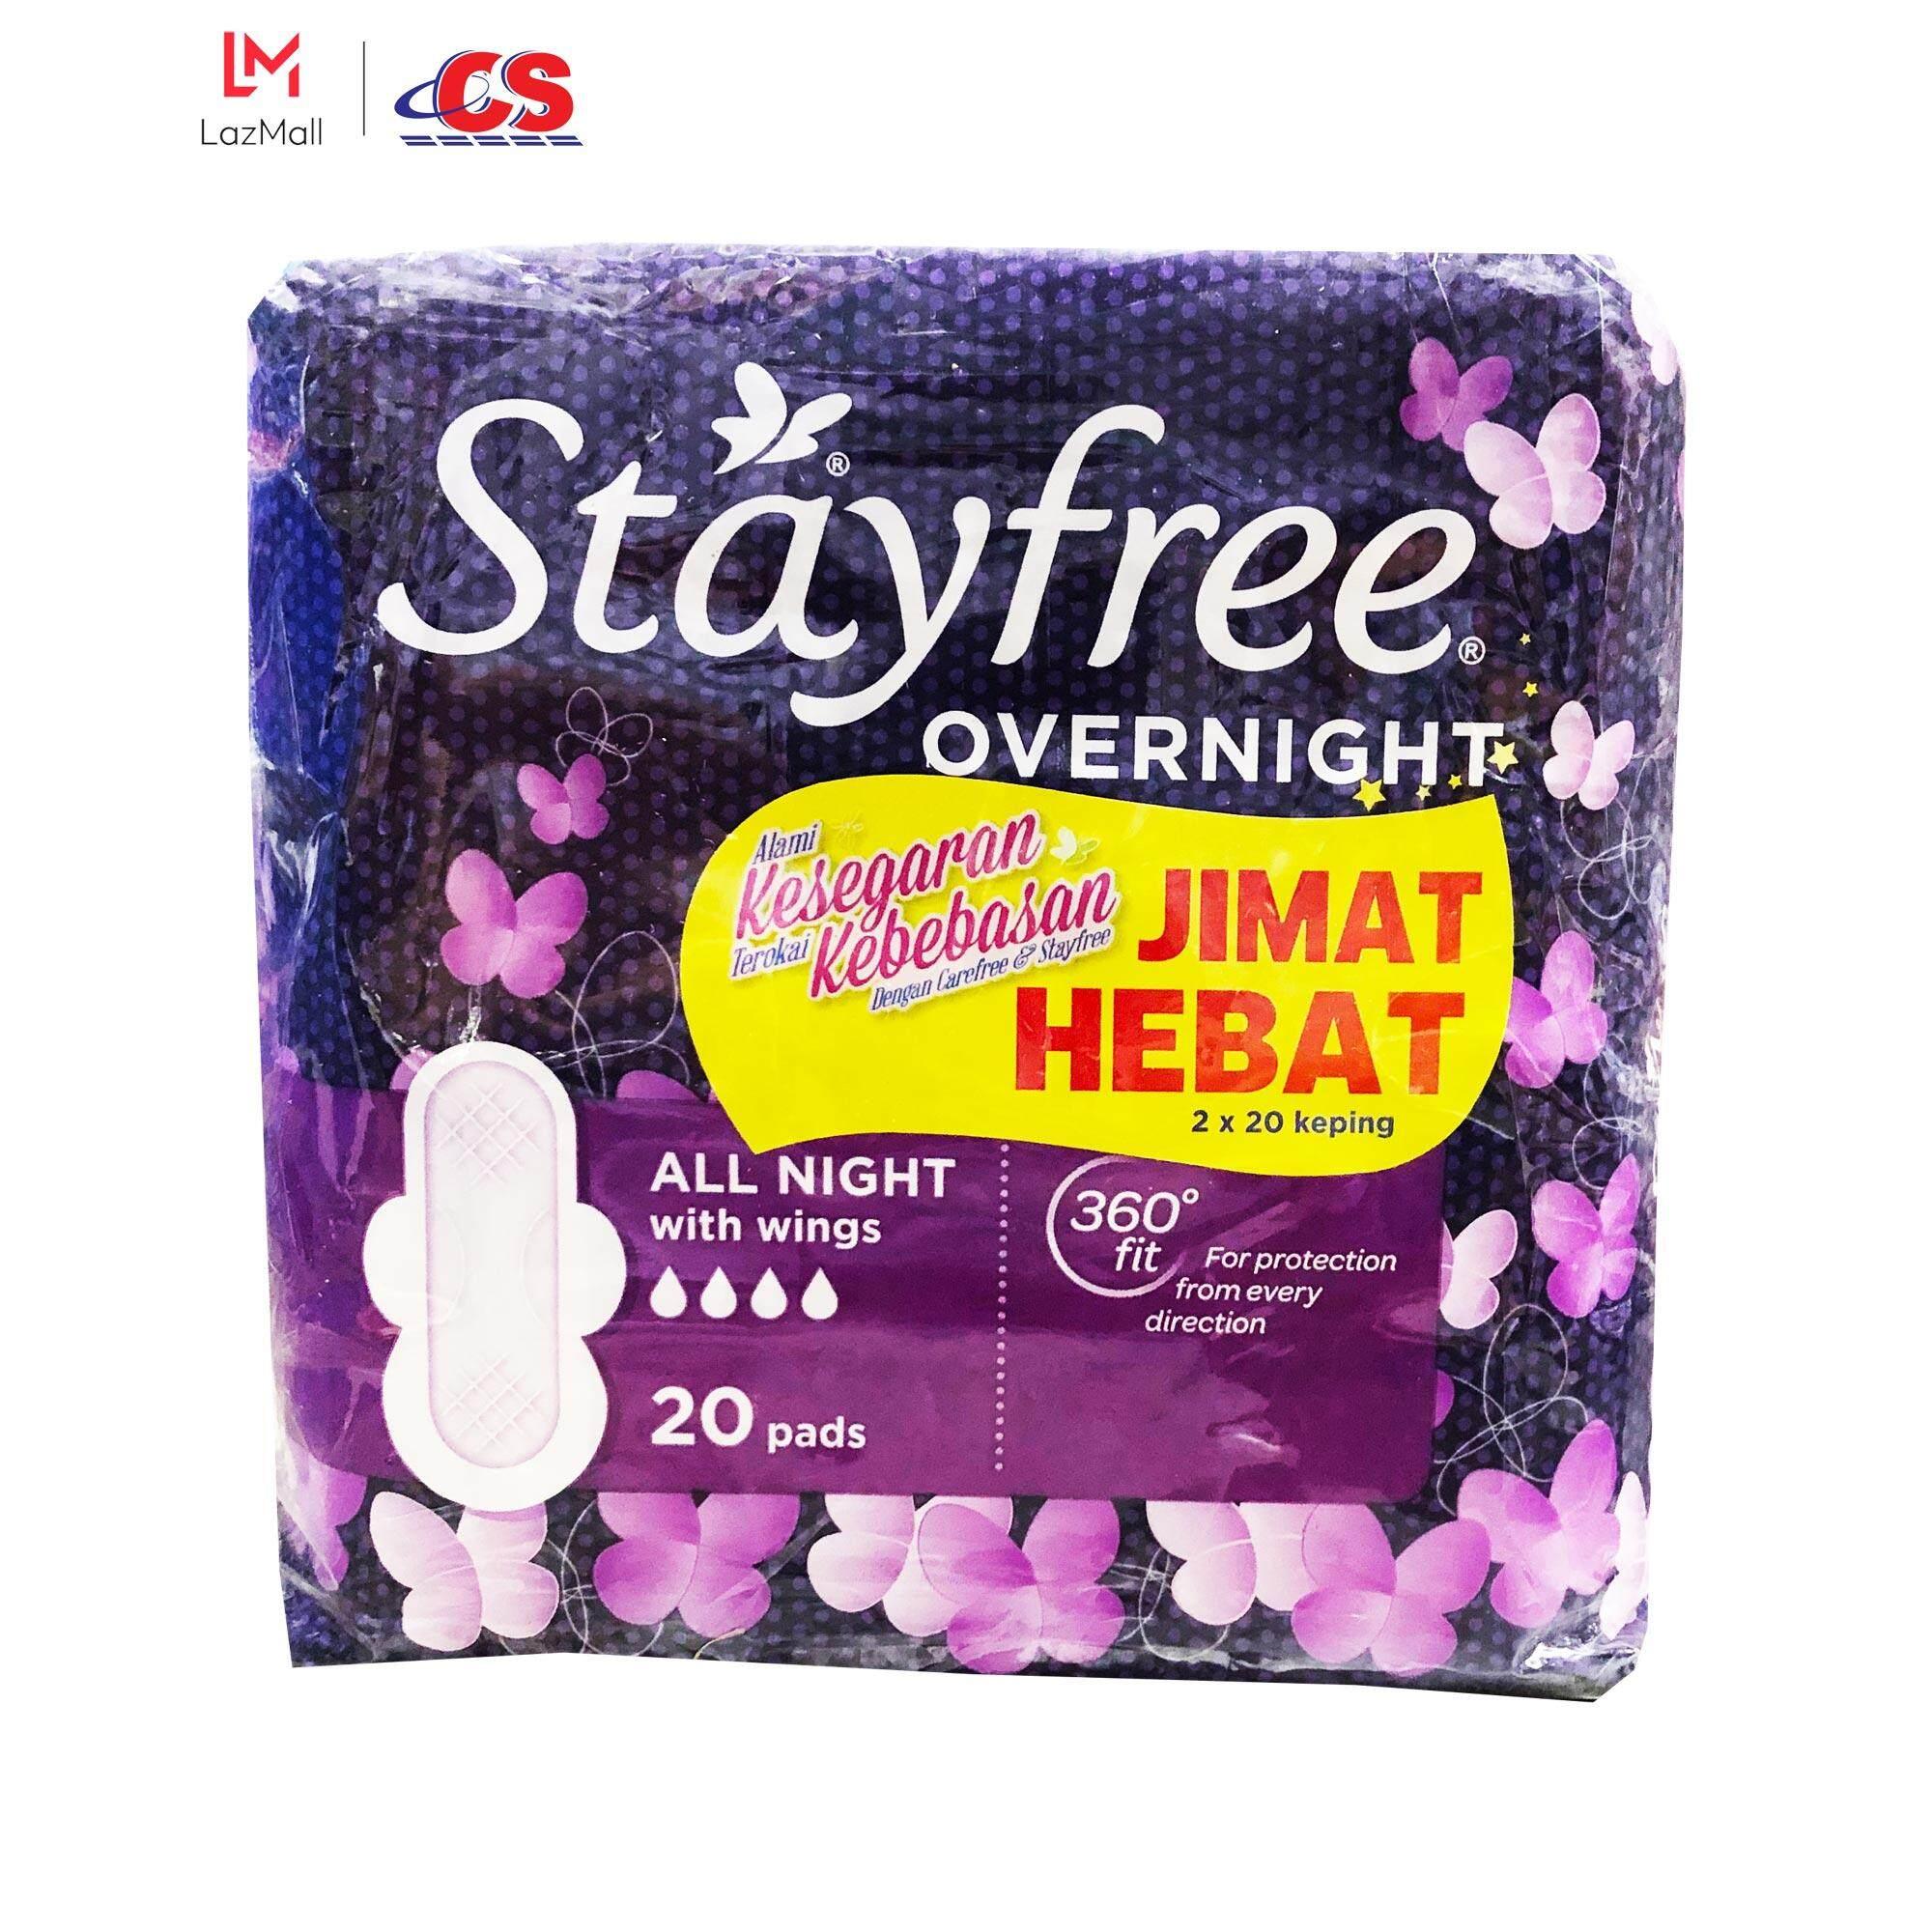 STAYFREE Cottony Soft Overnight Wing 2x20s